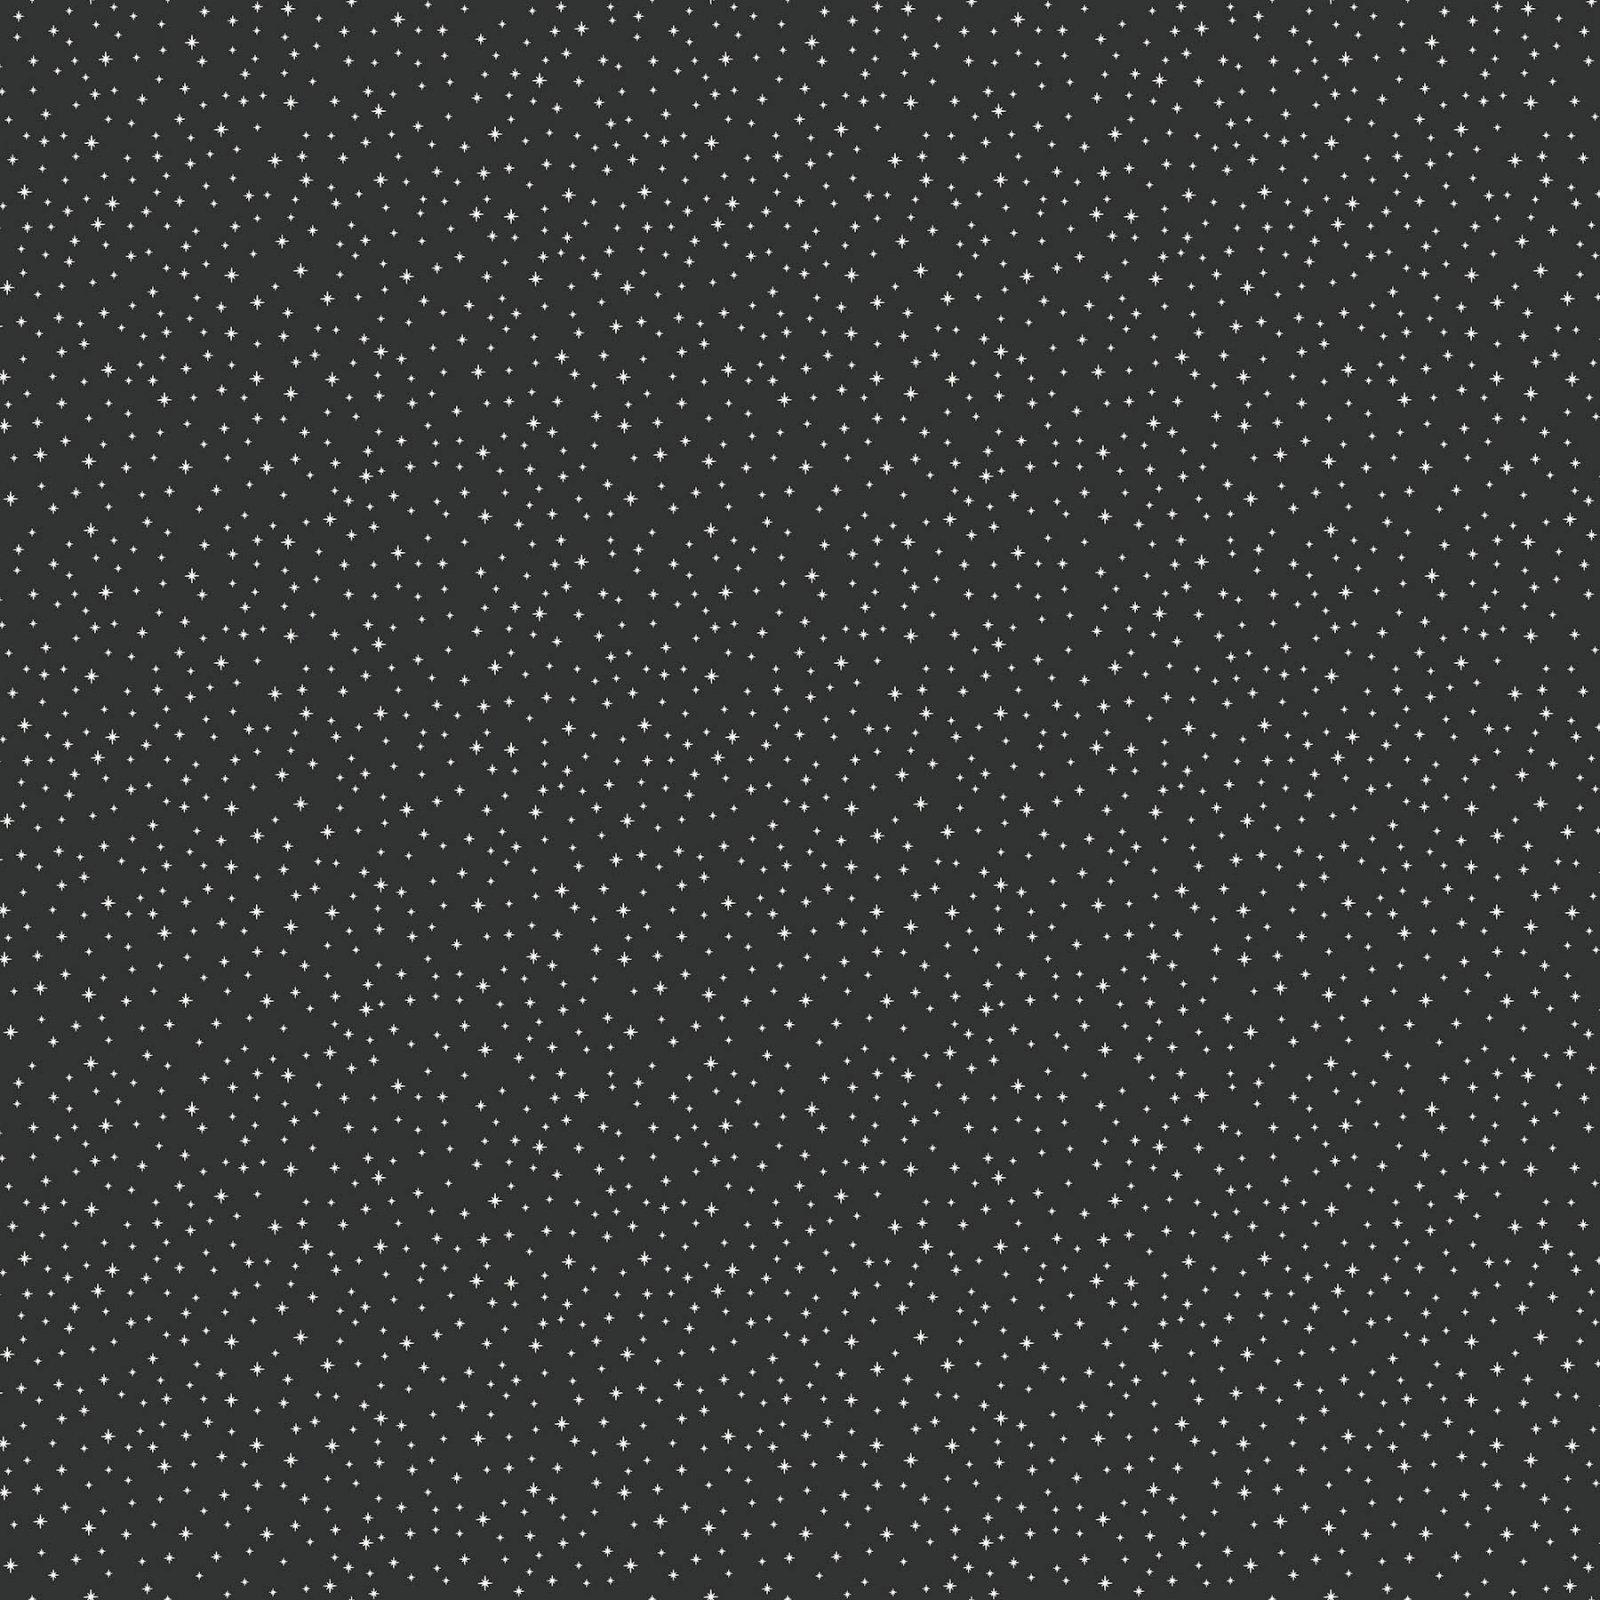 FIGO, Peppermint - Stars Black